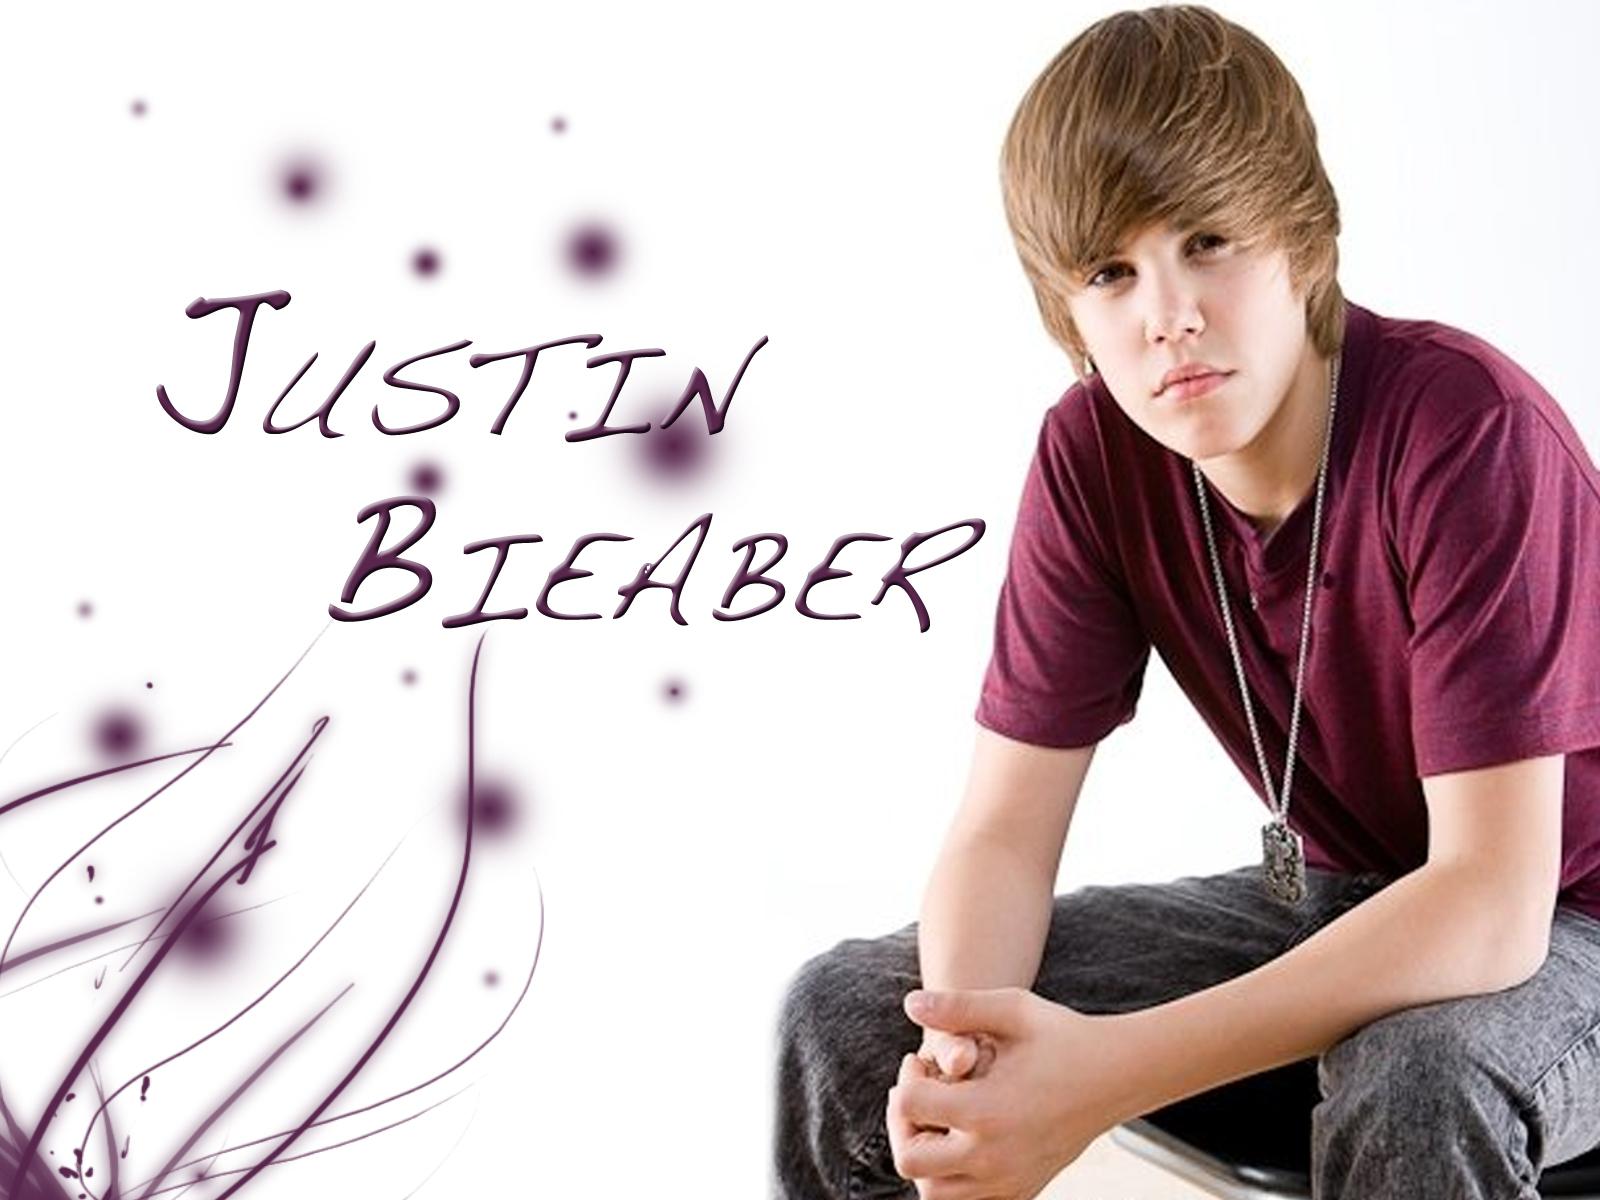 Justin Bieber justin bieber 28025736 1600 1200 1600x1200